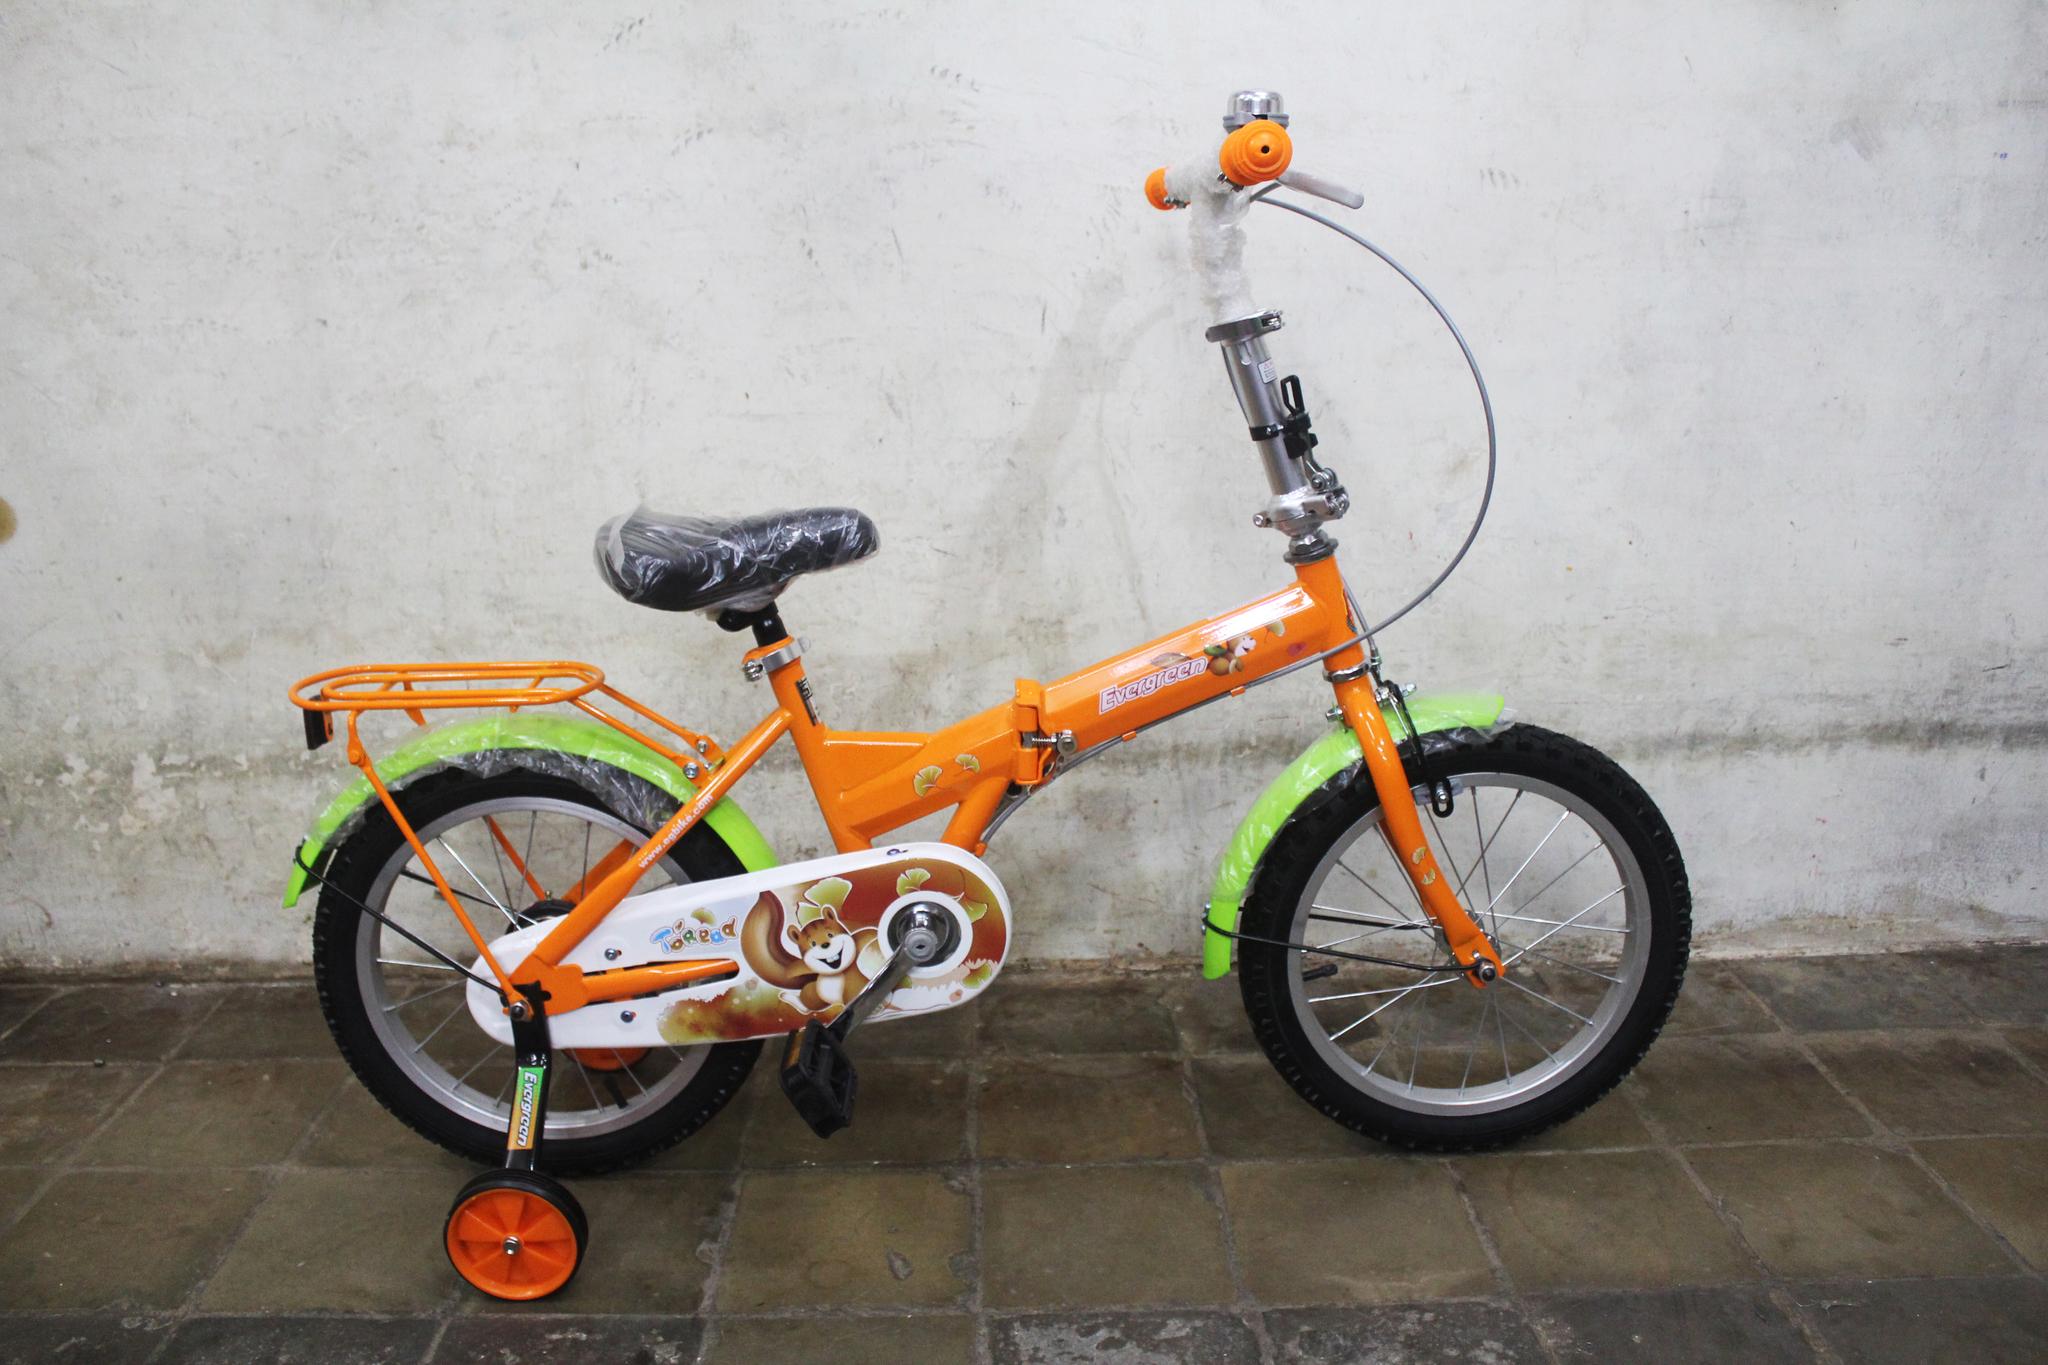 Jual Sepeda Lipat Evergreen Type 116 ukuran 16 warna